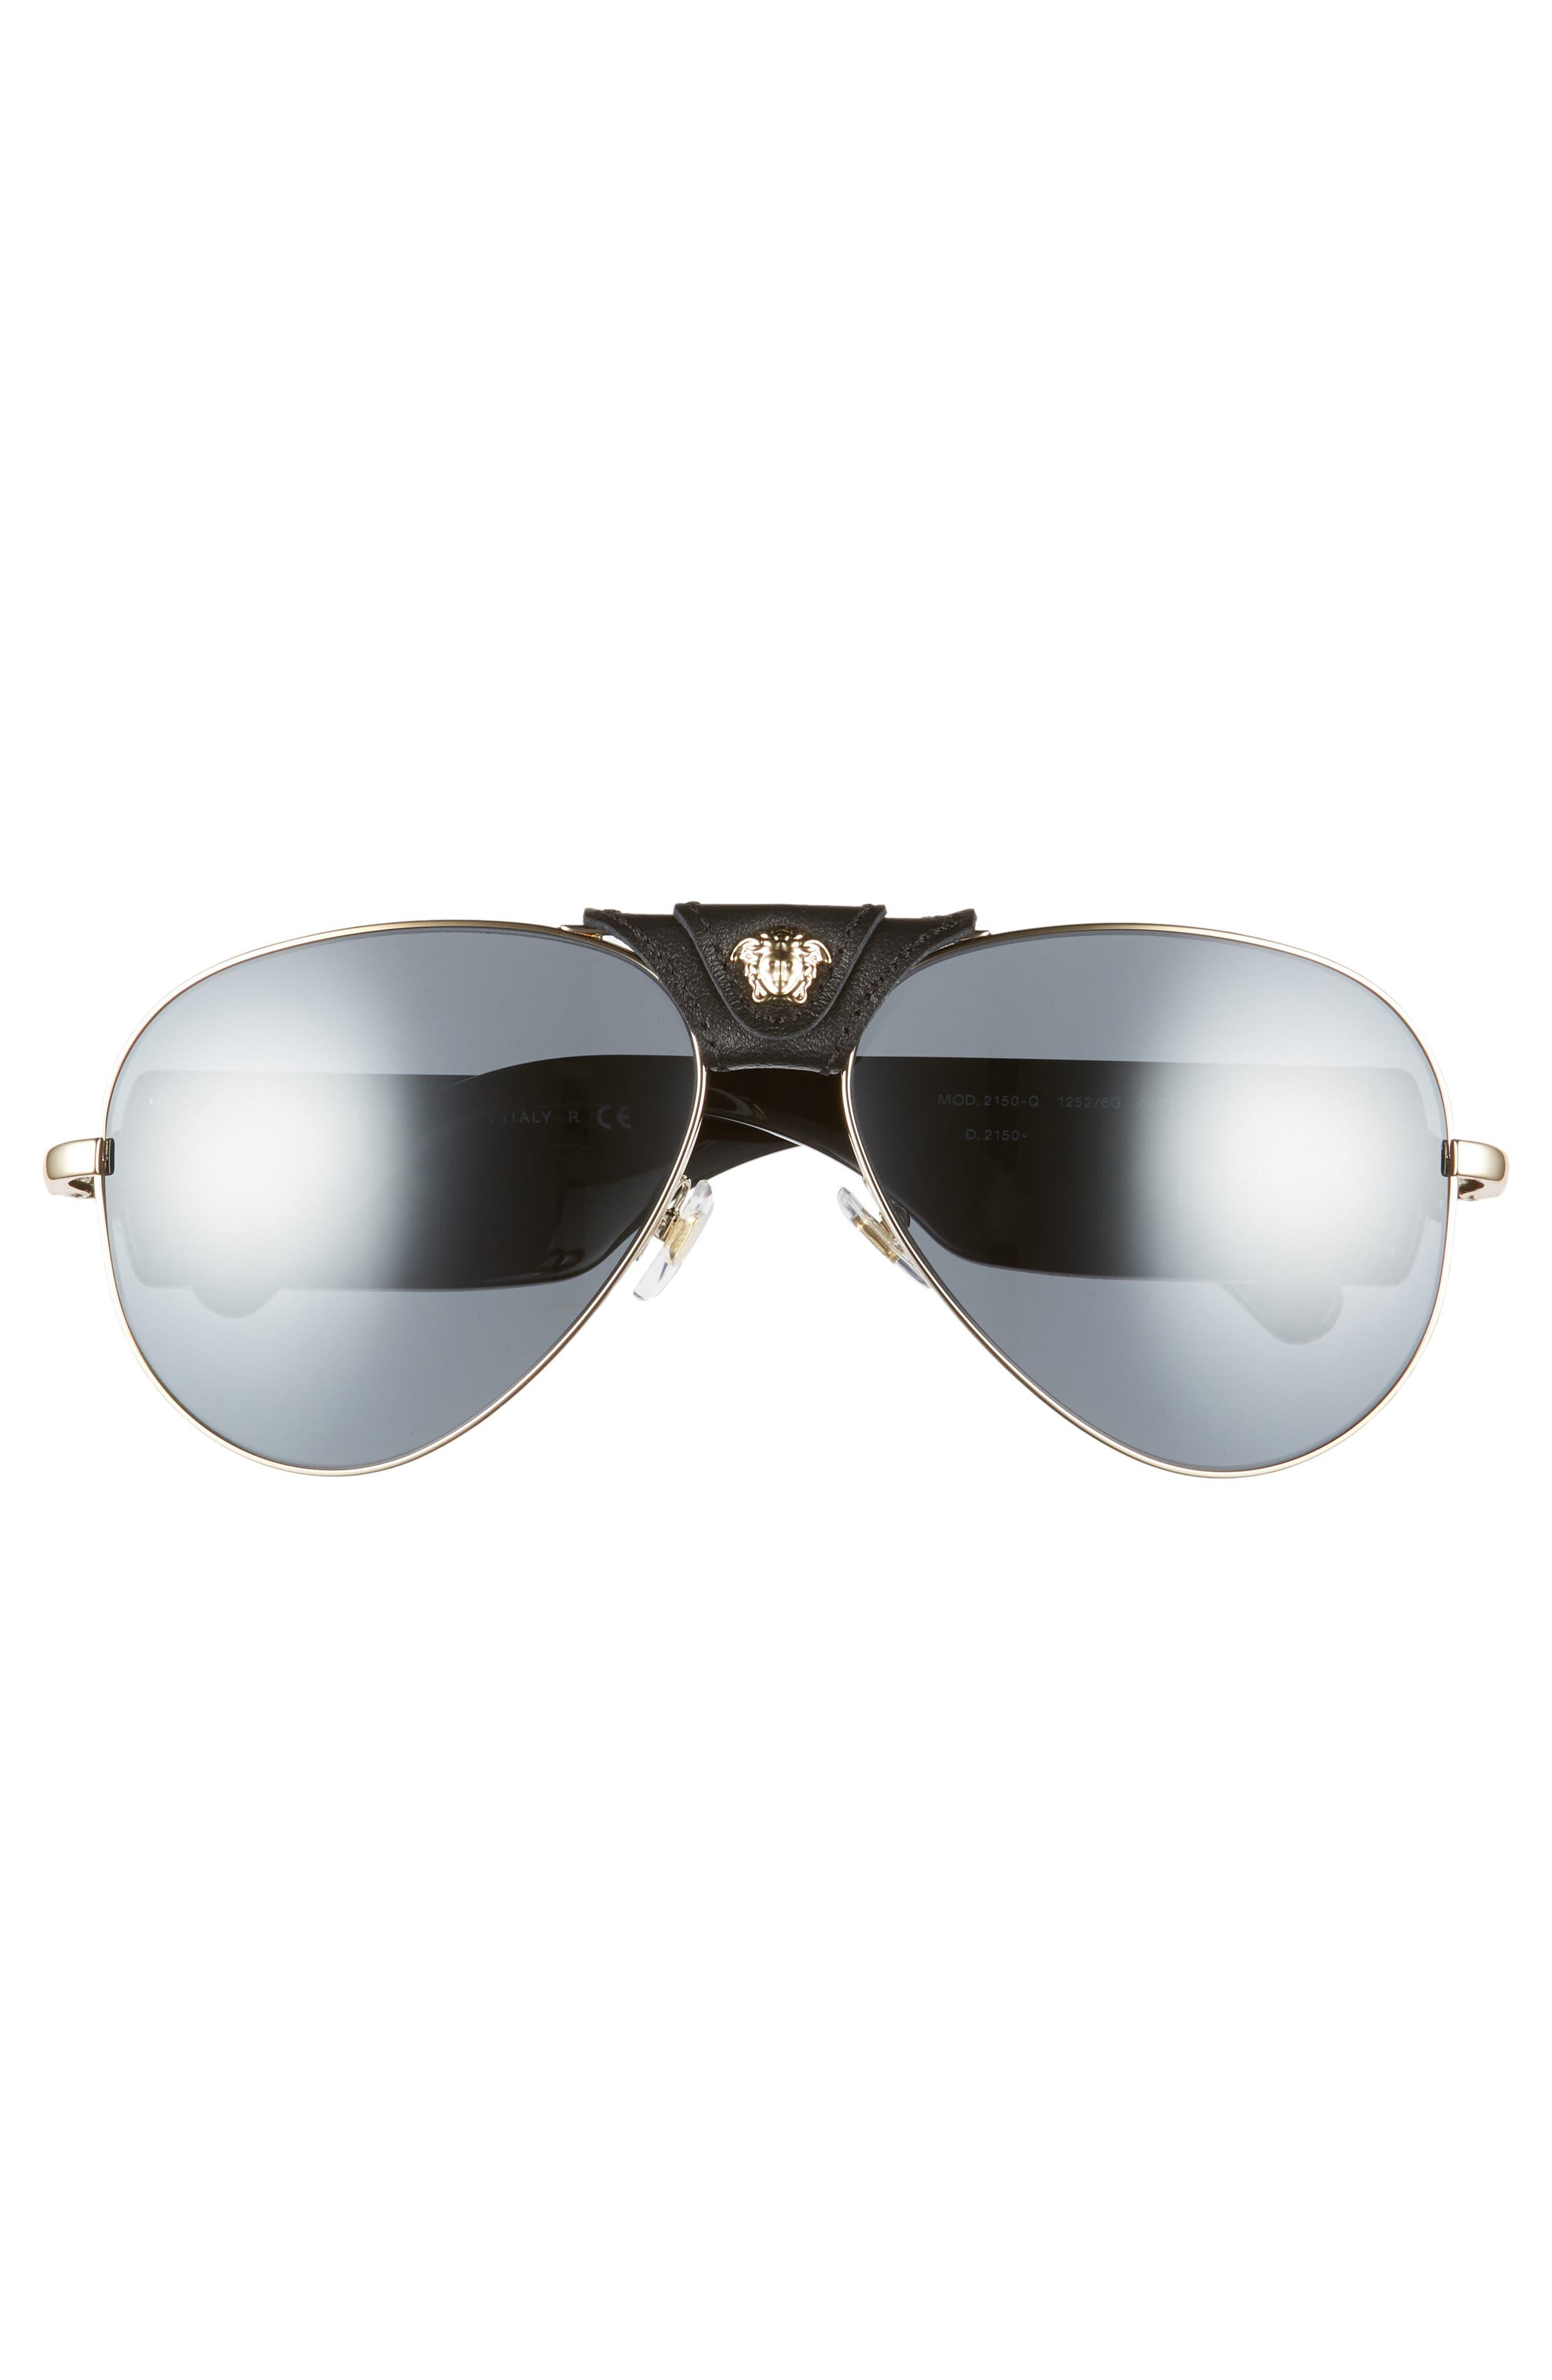 VERSACE,                             62mm Aviator Sunglasses,                             Alternate thumbnail 2, color,                             GOLD/ BLACK